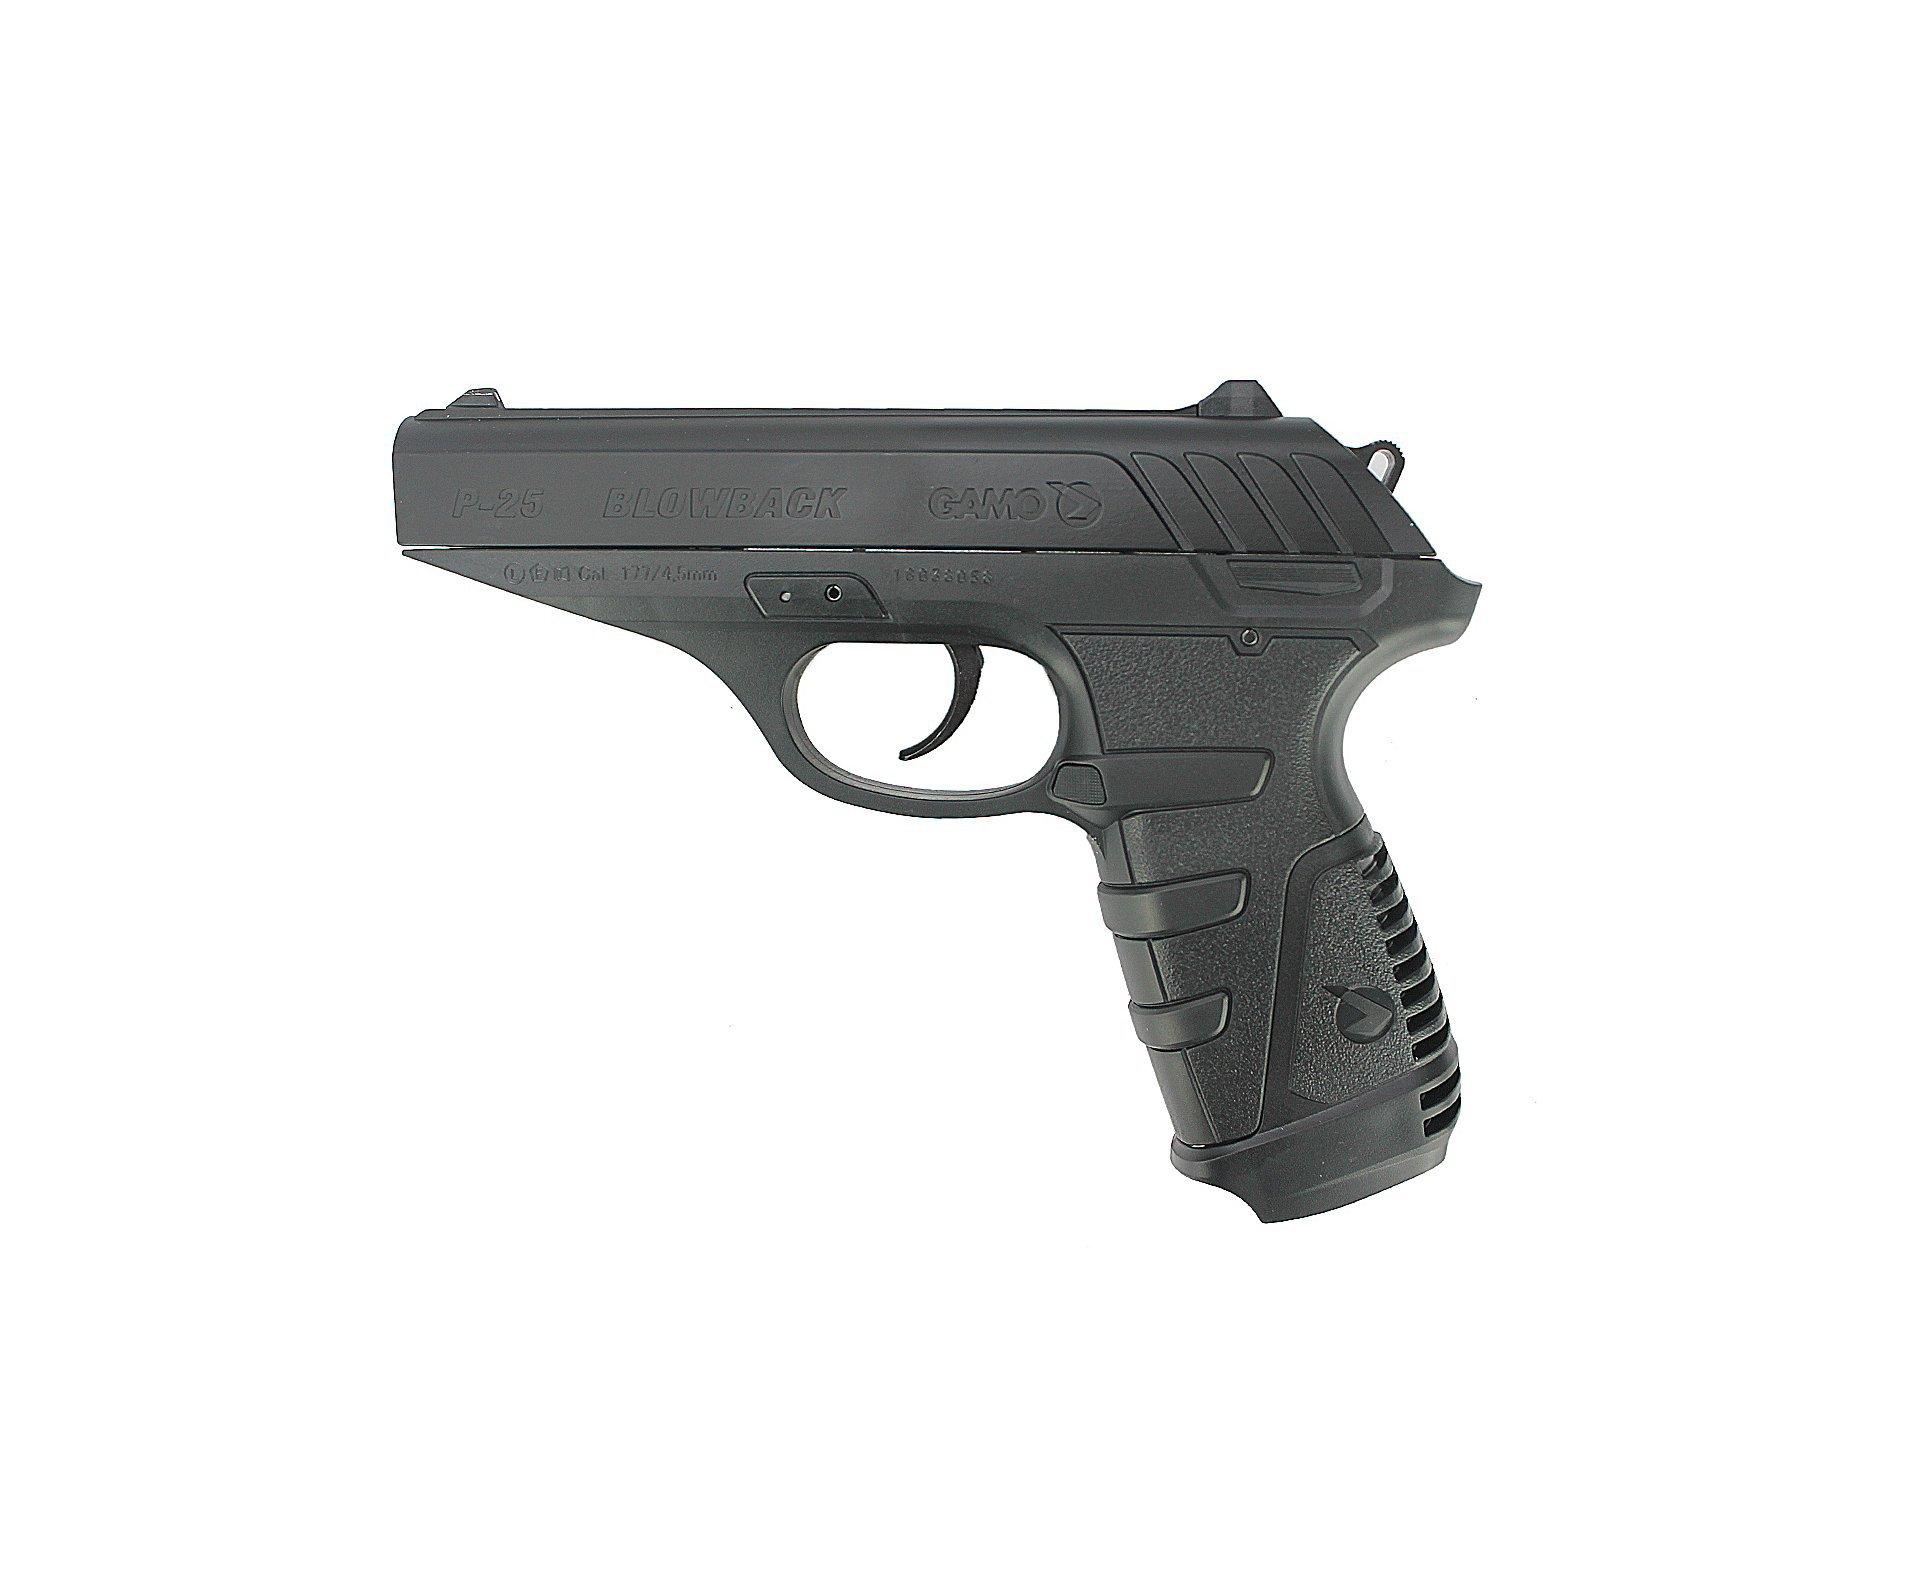 Pistola De Pressão A Gás Gamo Gbb Co2 P-25 Blowback Slide Metal Black 4.5mm